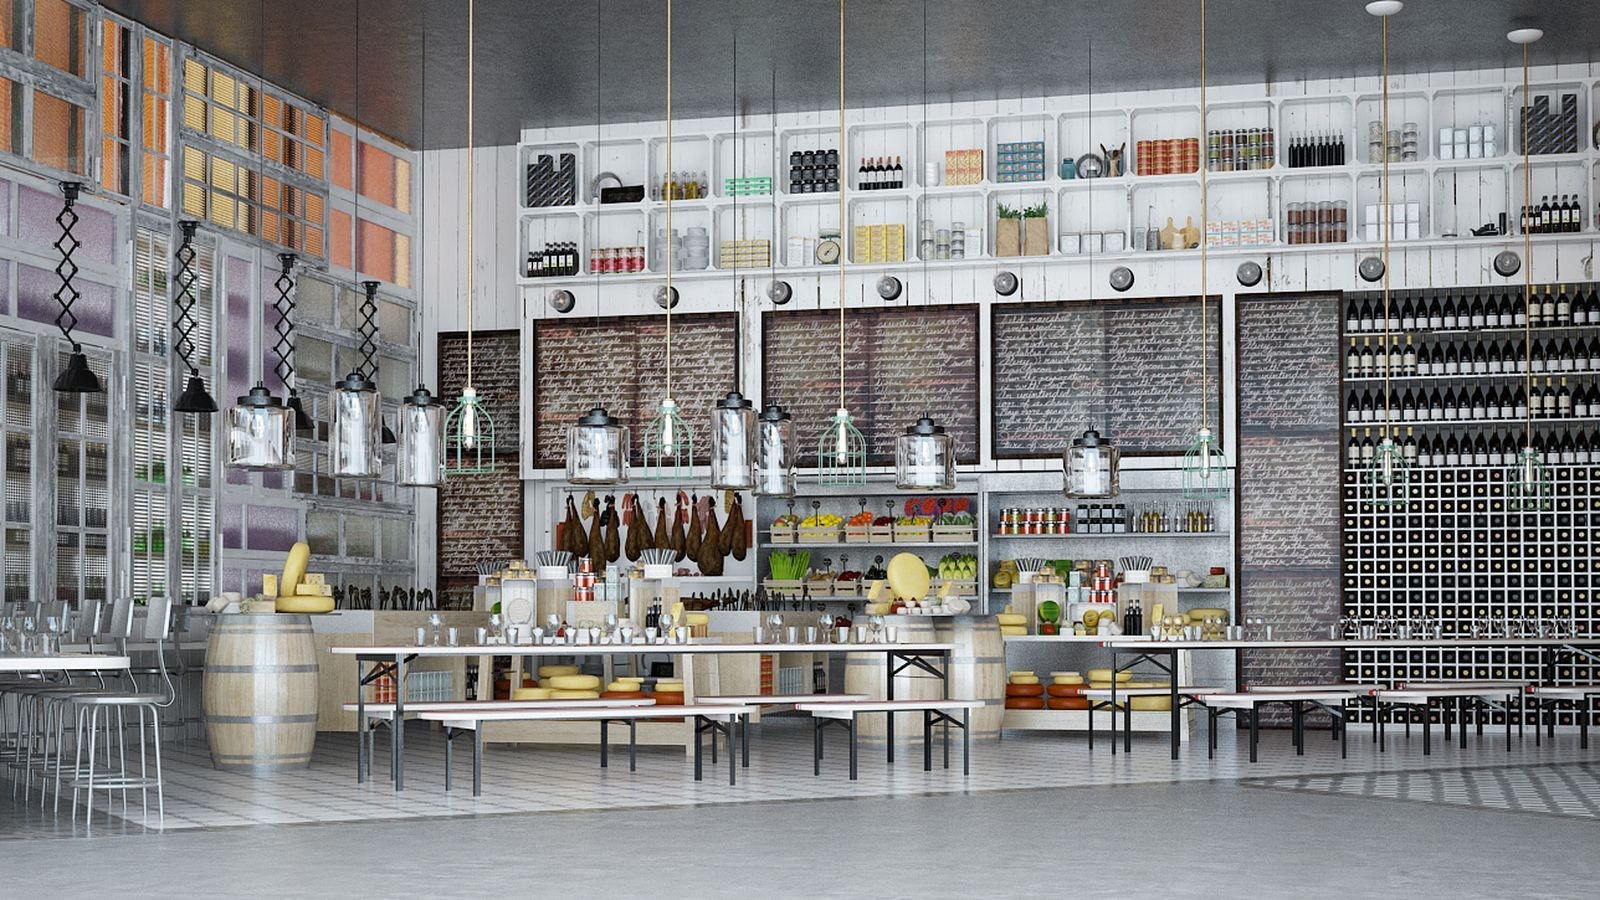 Latincity chicago google search latin food cafe